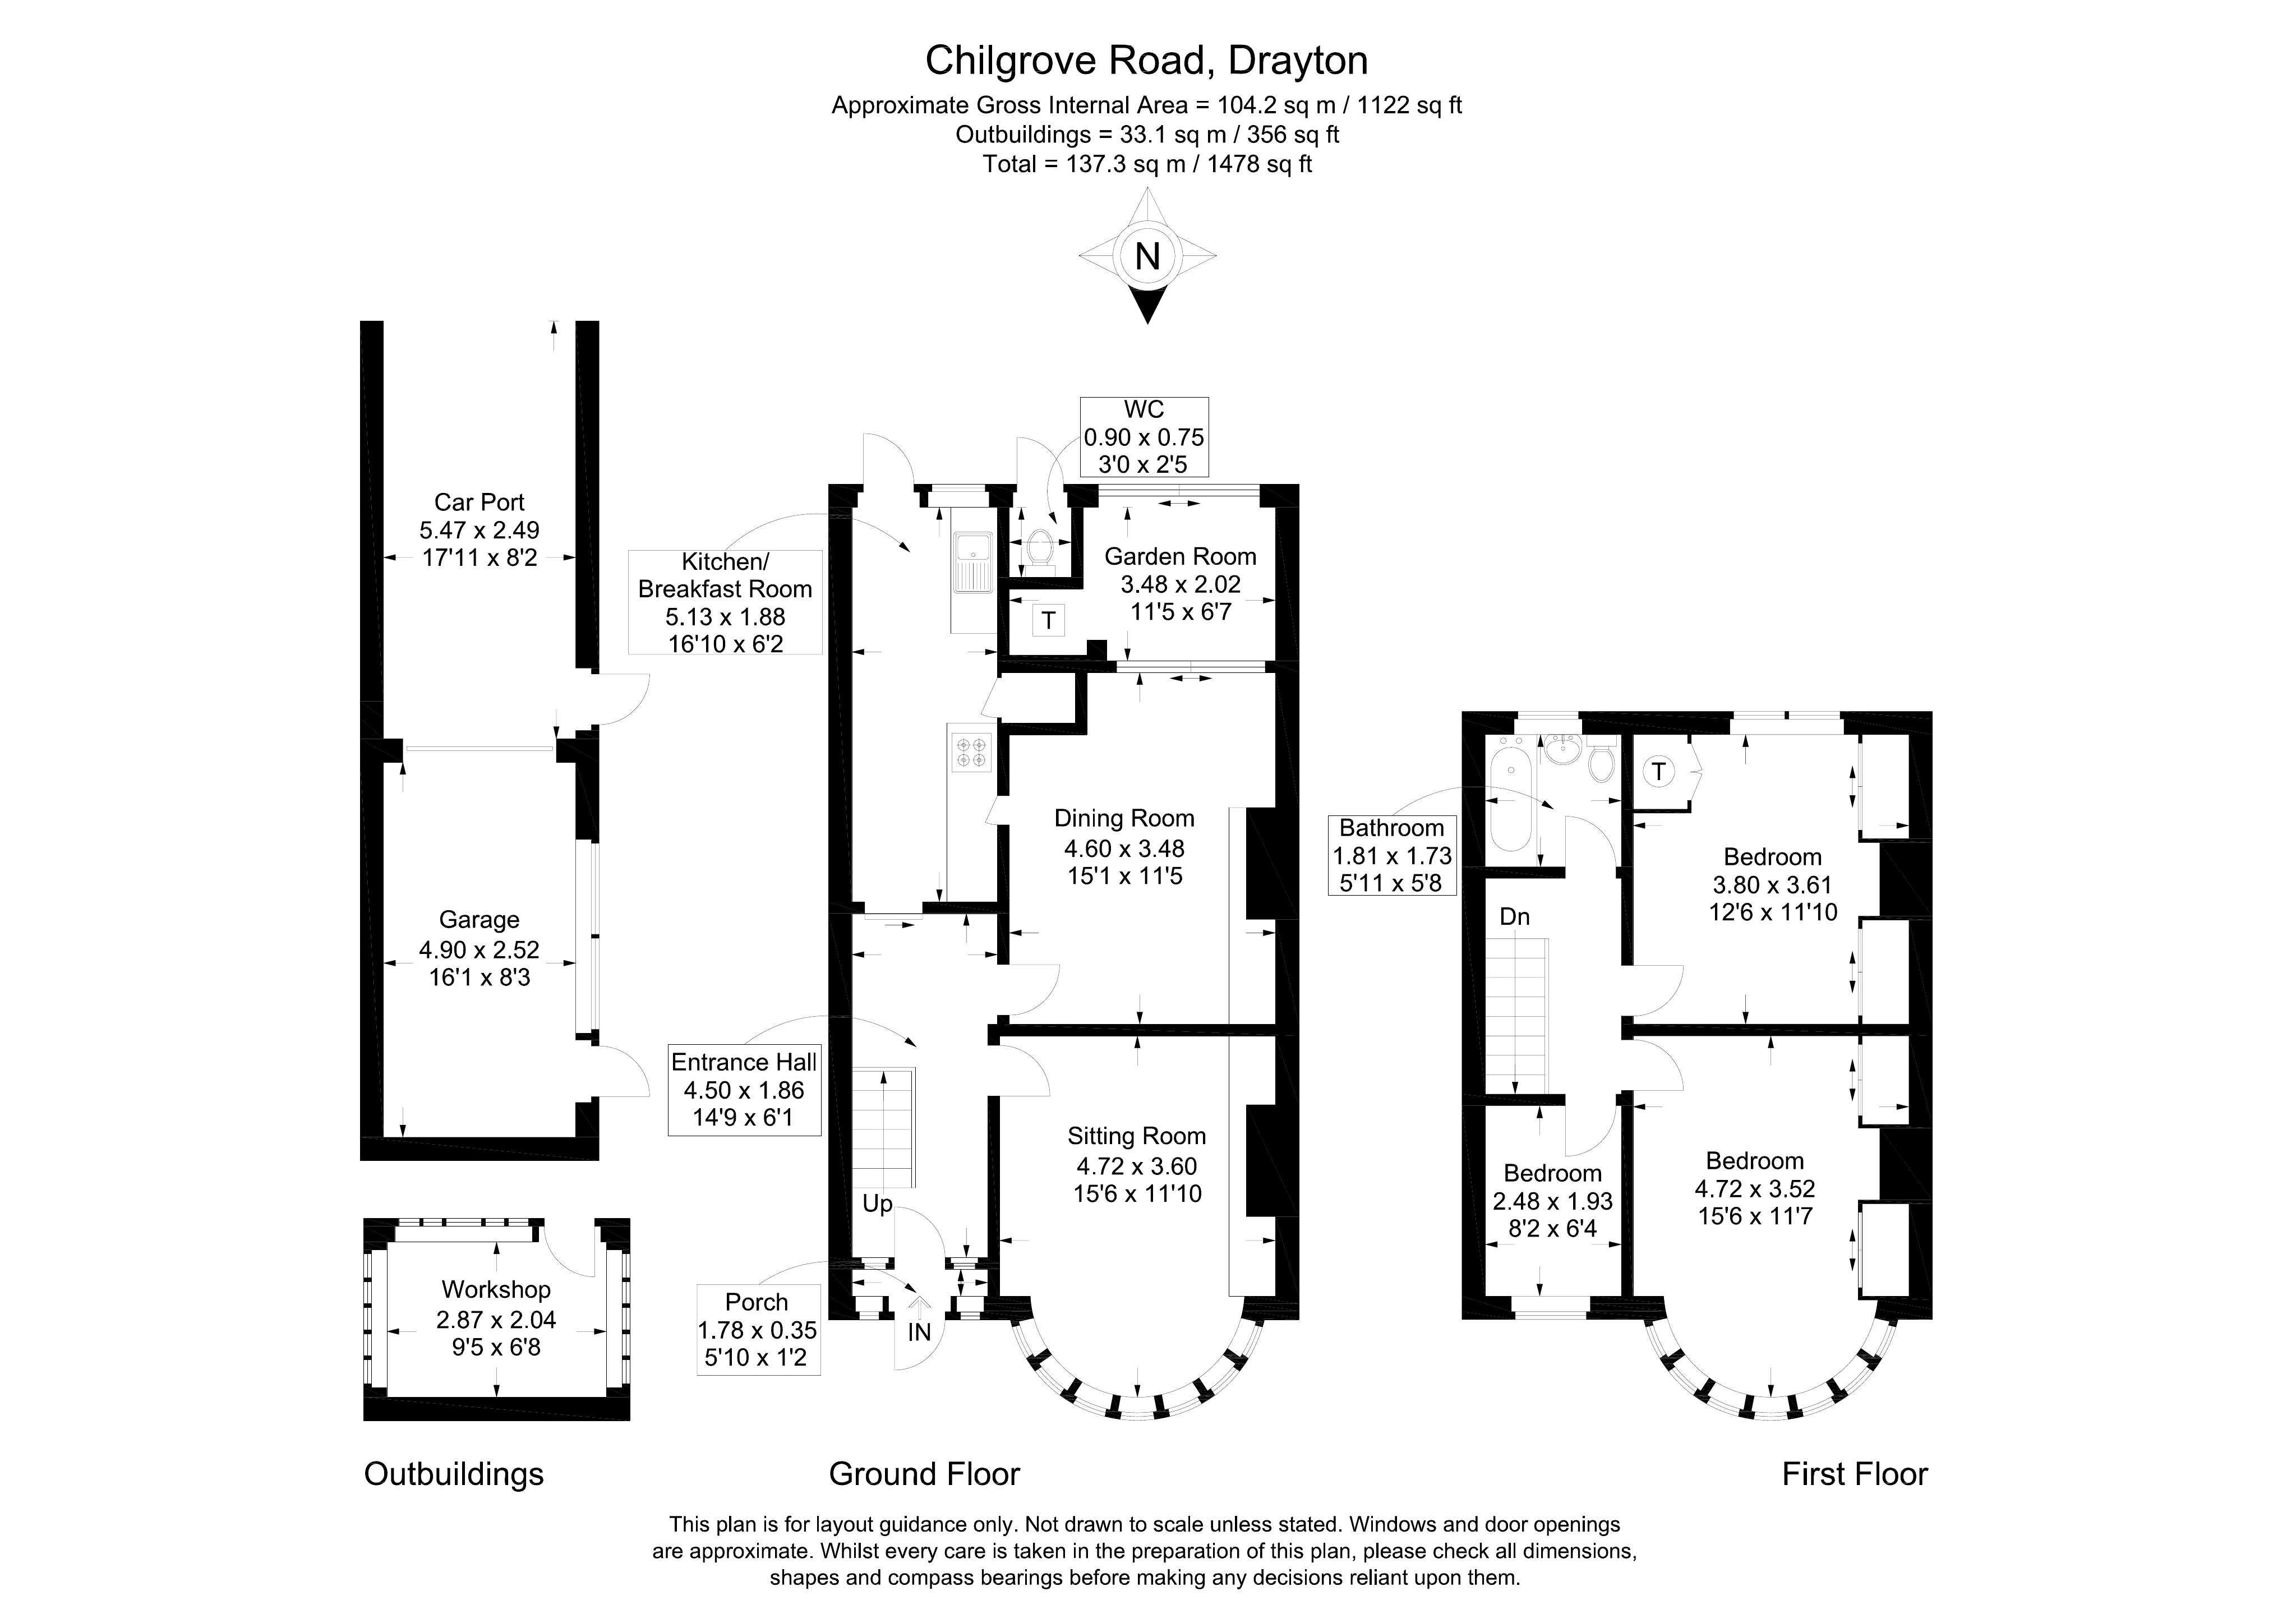 Chilgrove Road Drayton